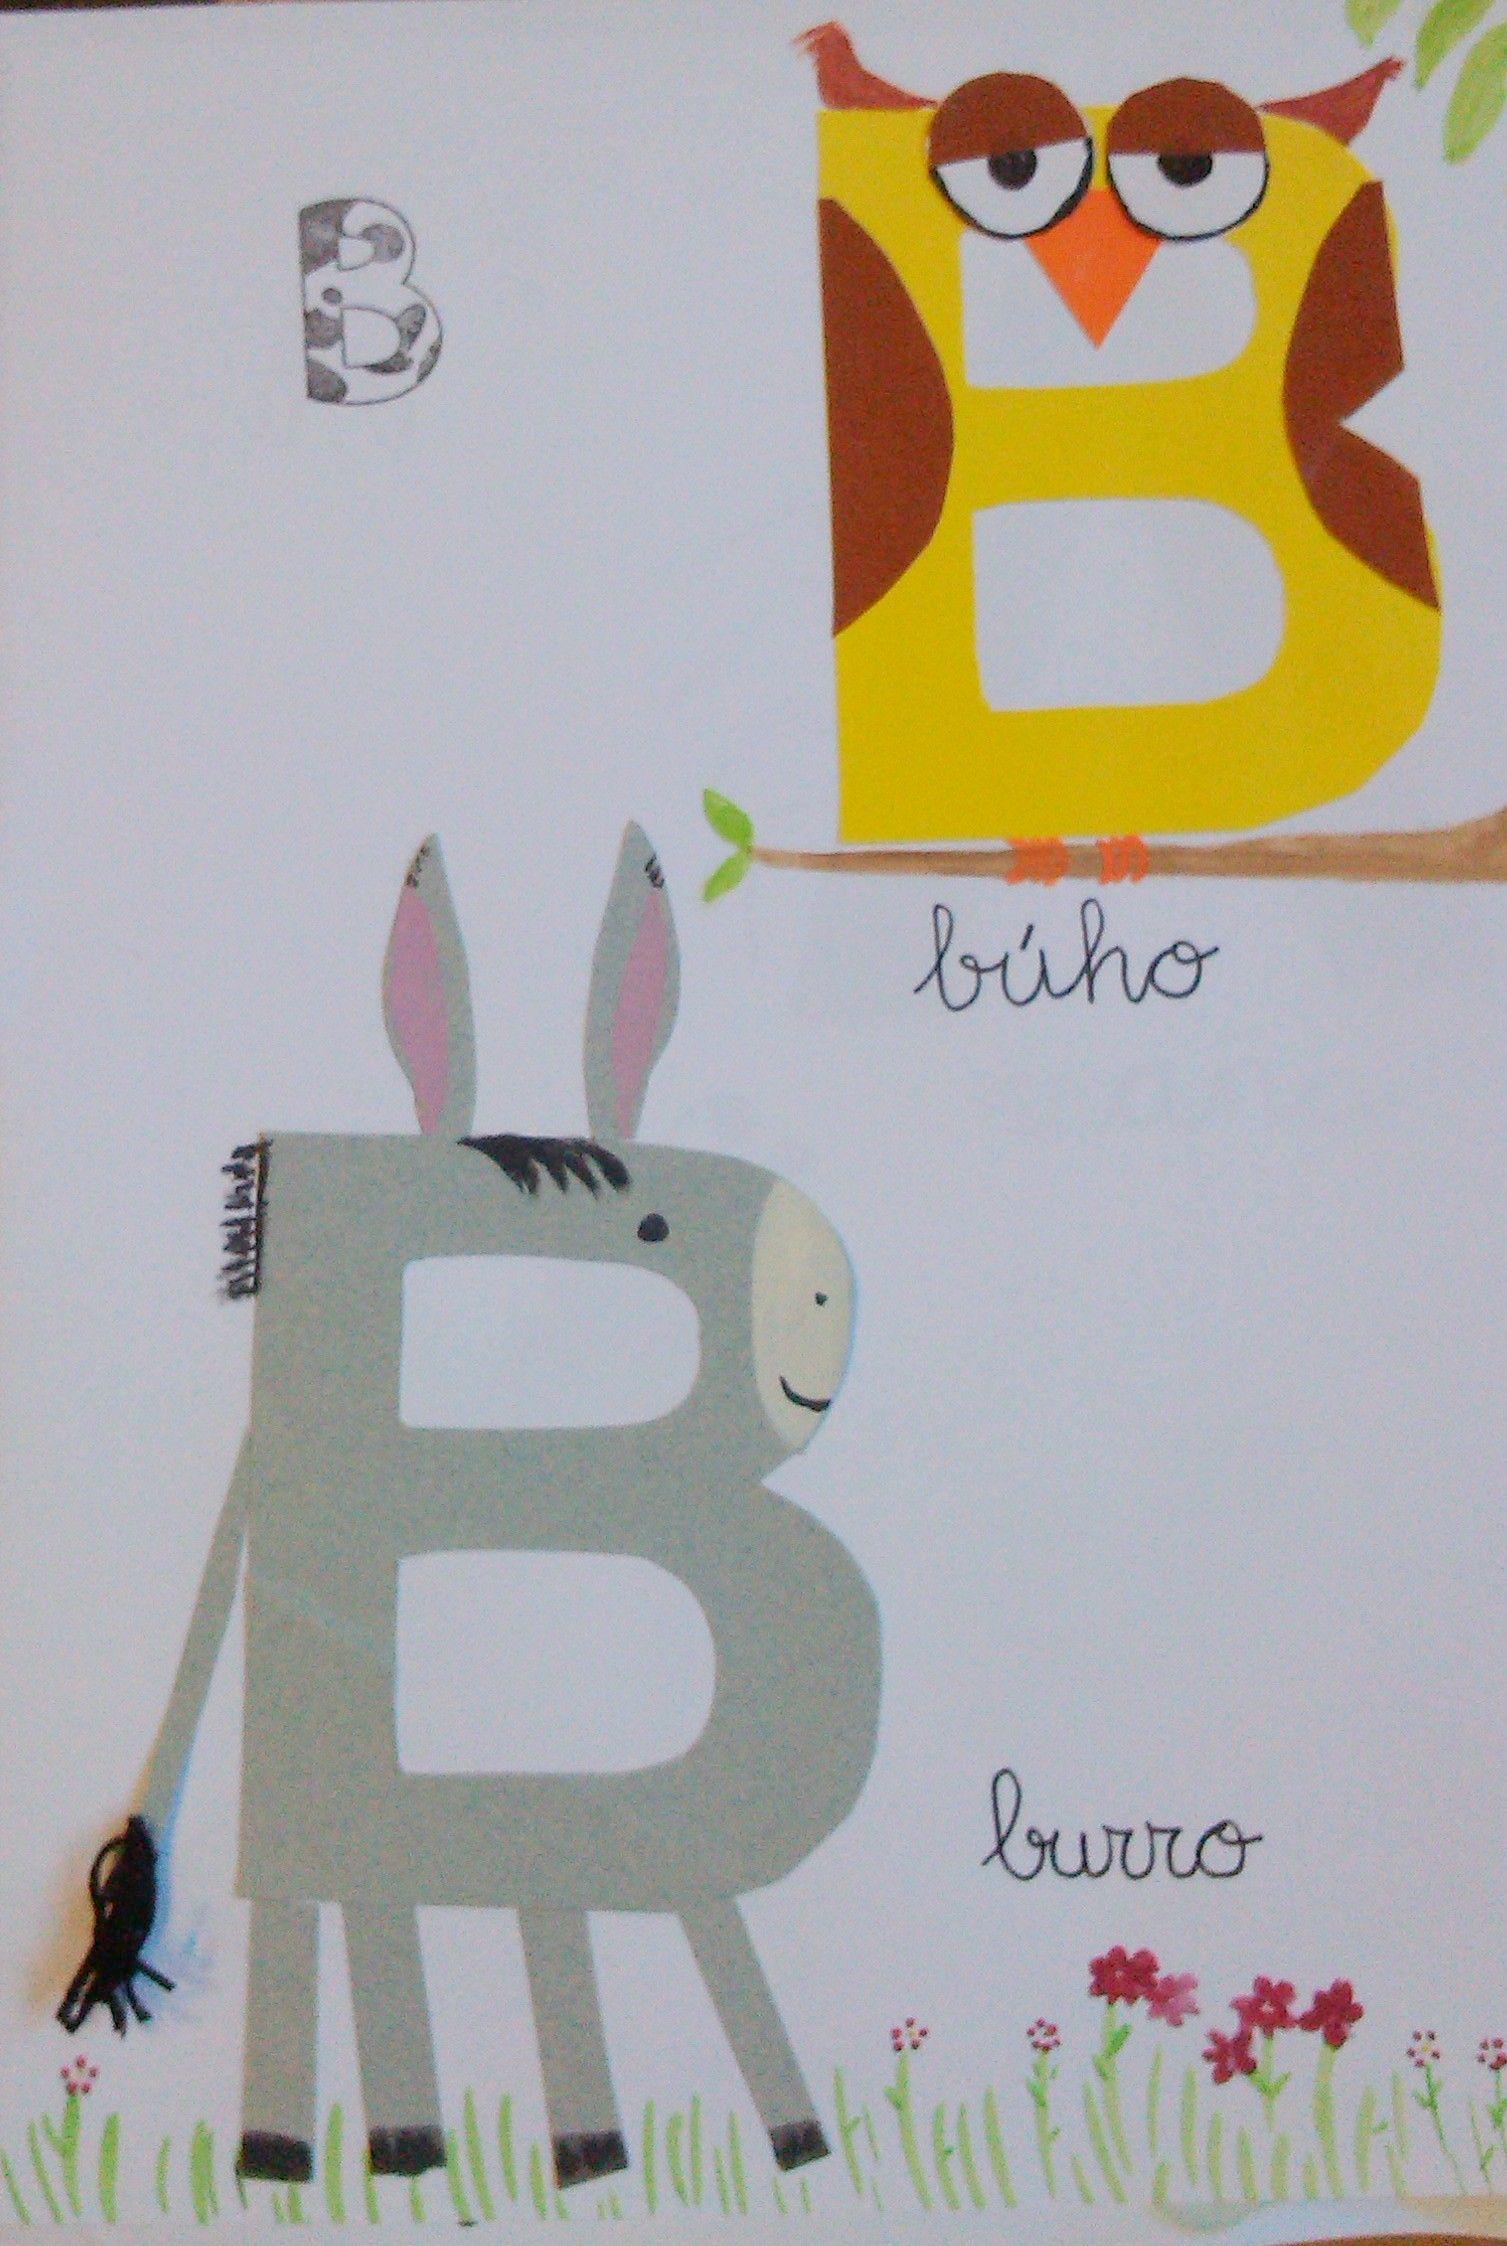 animalario letra b abecedario spanish alphabet letter a crafts preschool letters. Black Bedroom Furniture Sets. Home Design Ideas